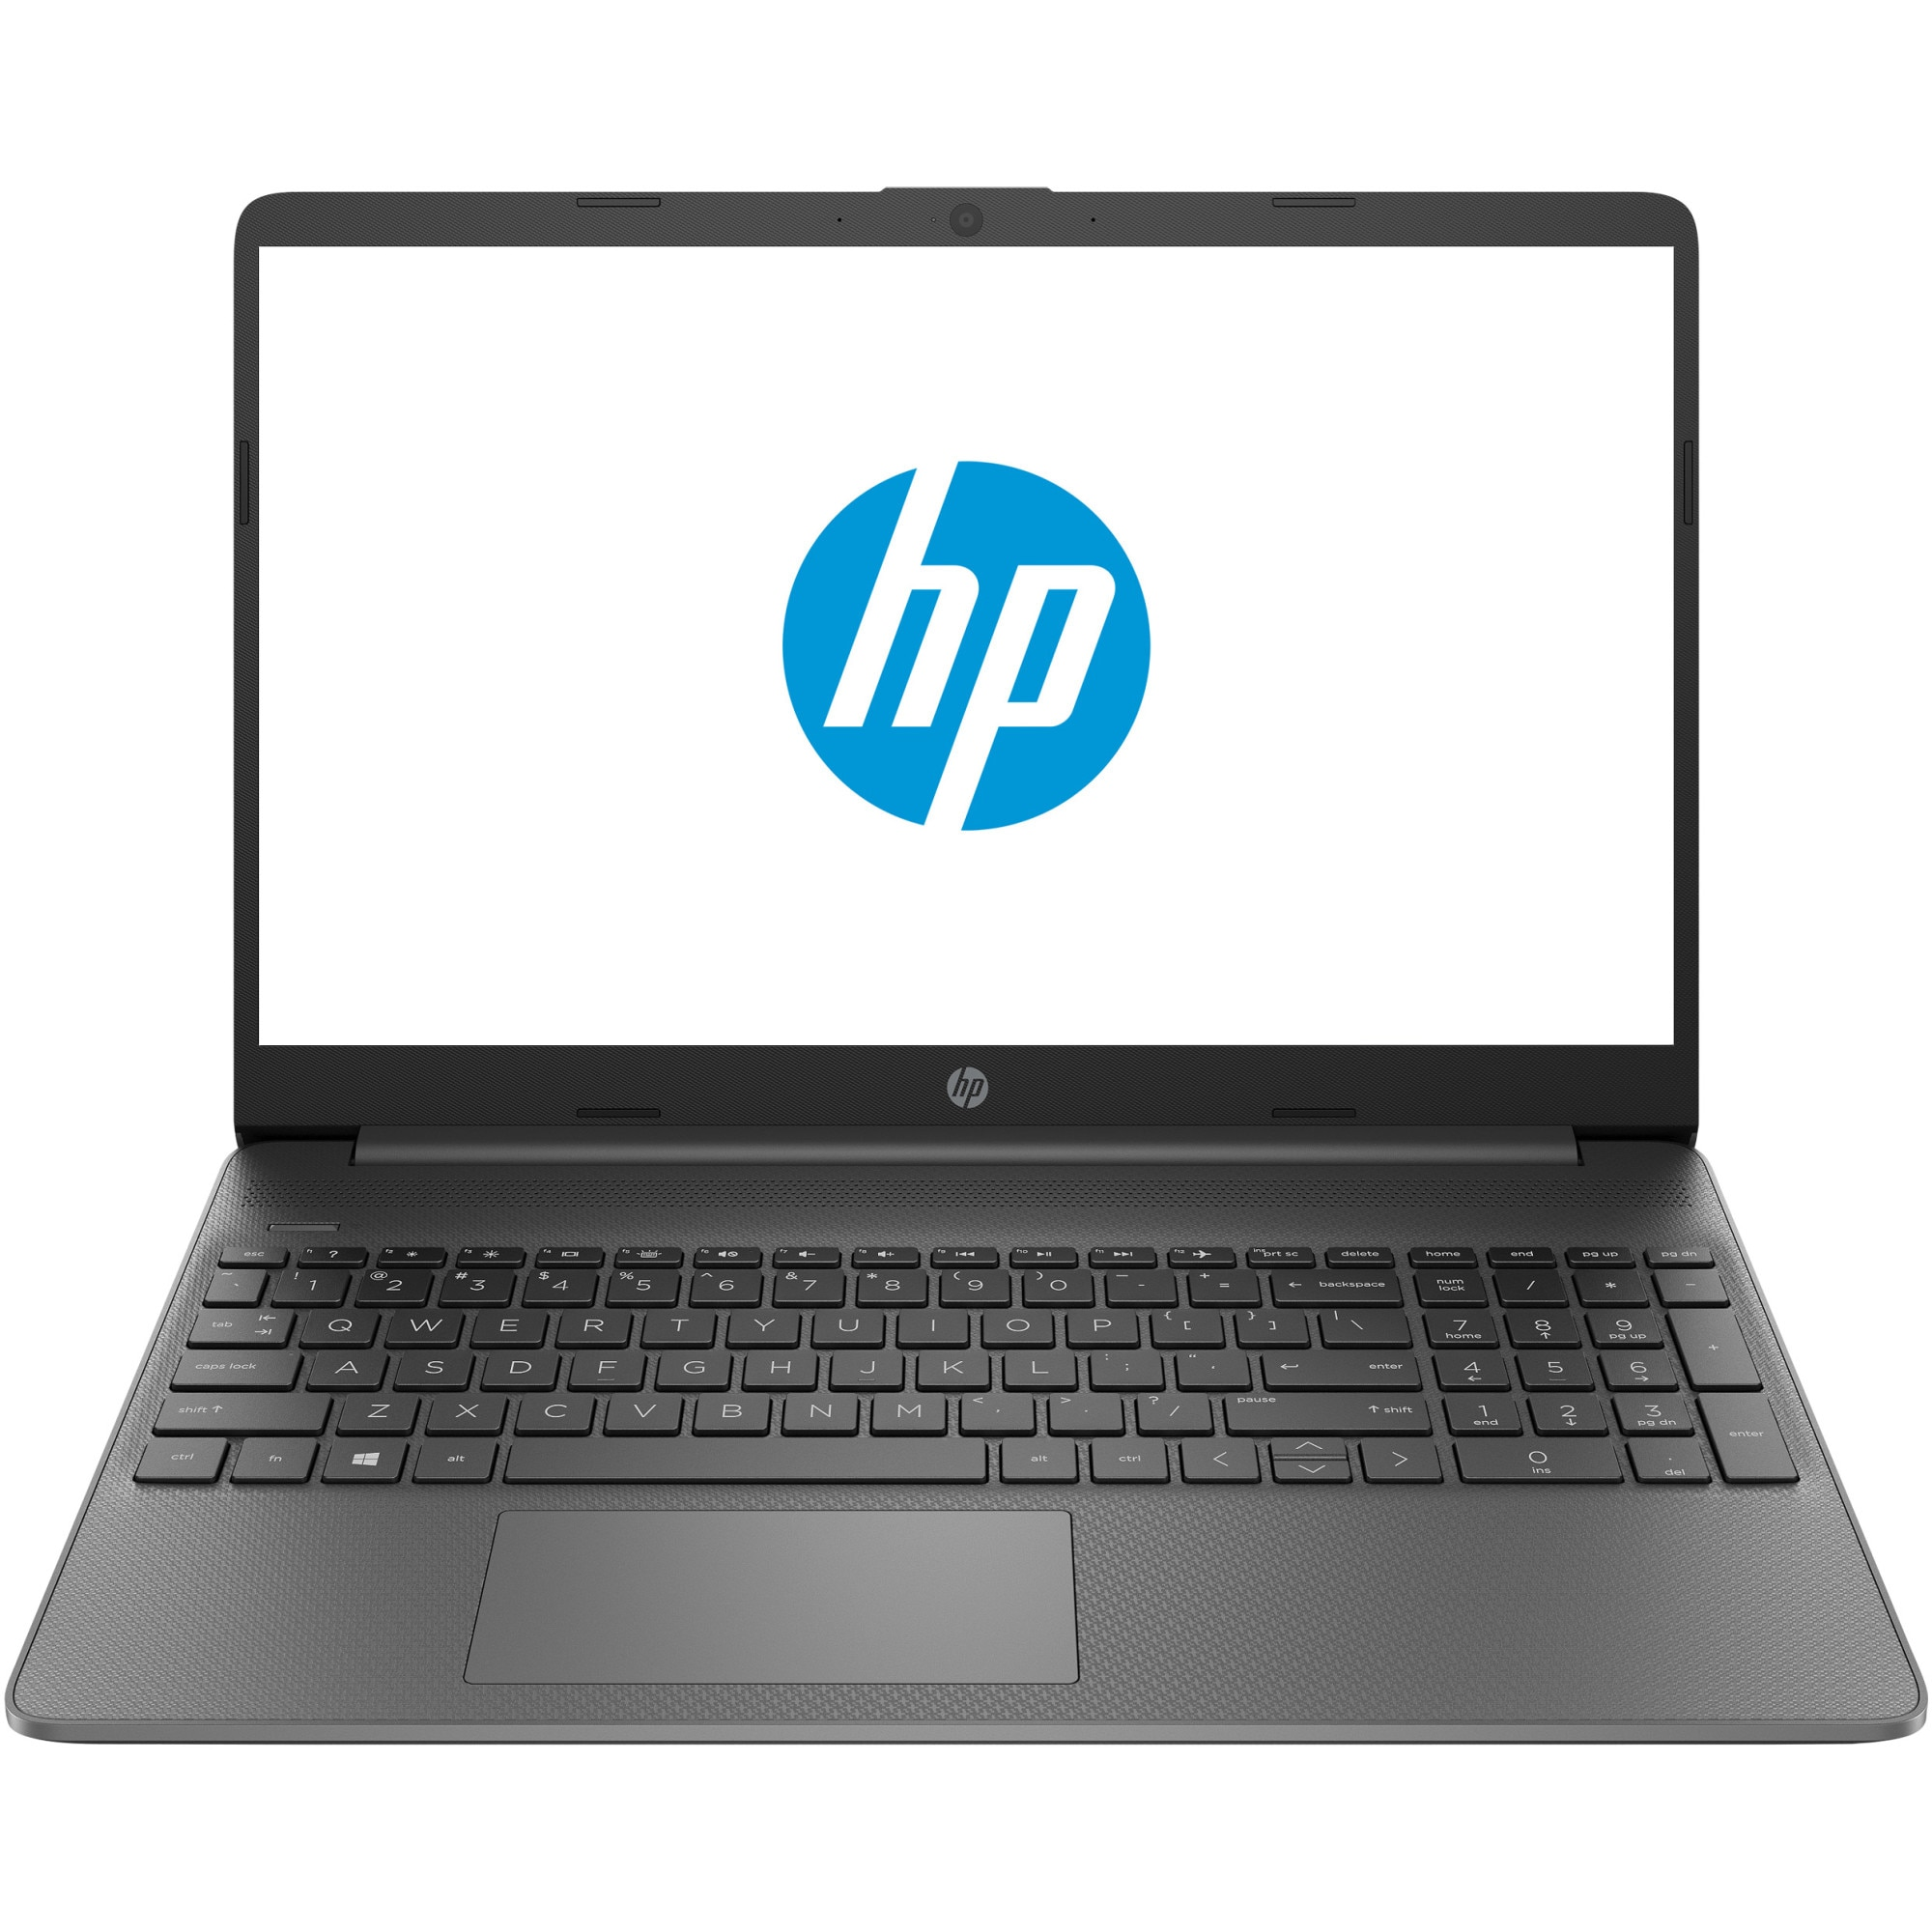 "Fotografie Laptop HP 15 15s-eq0003nq cu procesor AMD Ryzen 5 3500U pana la 3.70 GHz, 15.6"", Full HD, 8GB, 256GB SSD, AMD Radeon Vega Graphics, Free DOS, Gray"